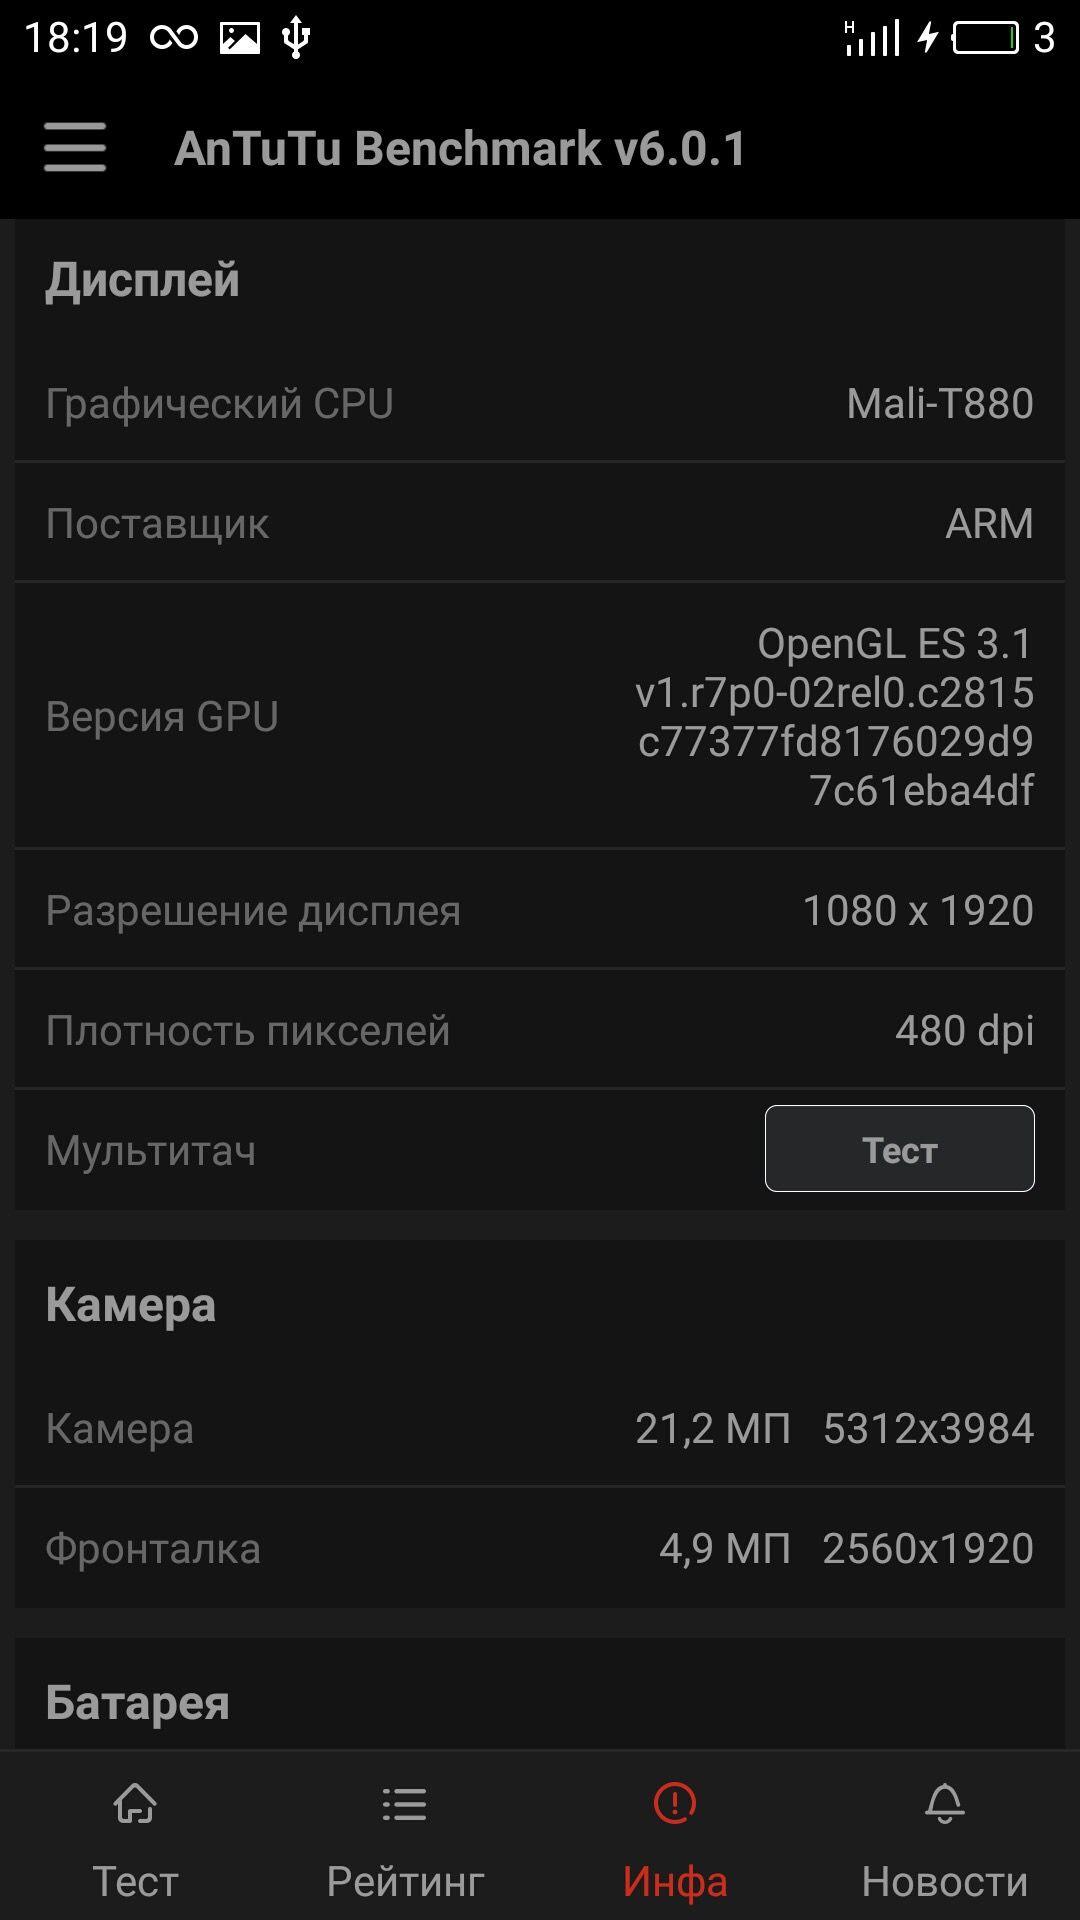 IMG_1396